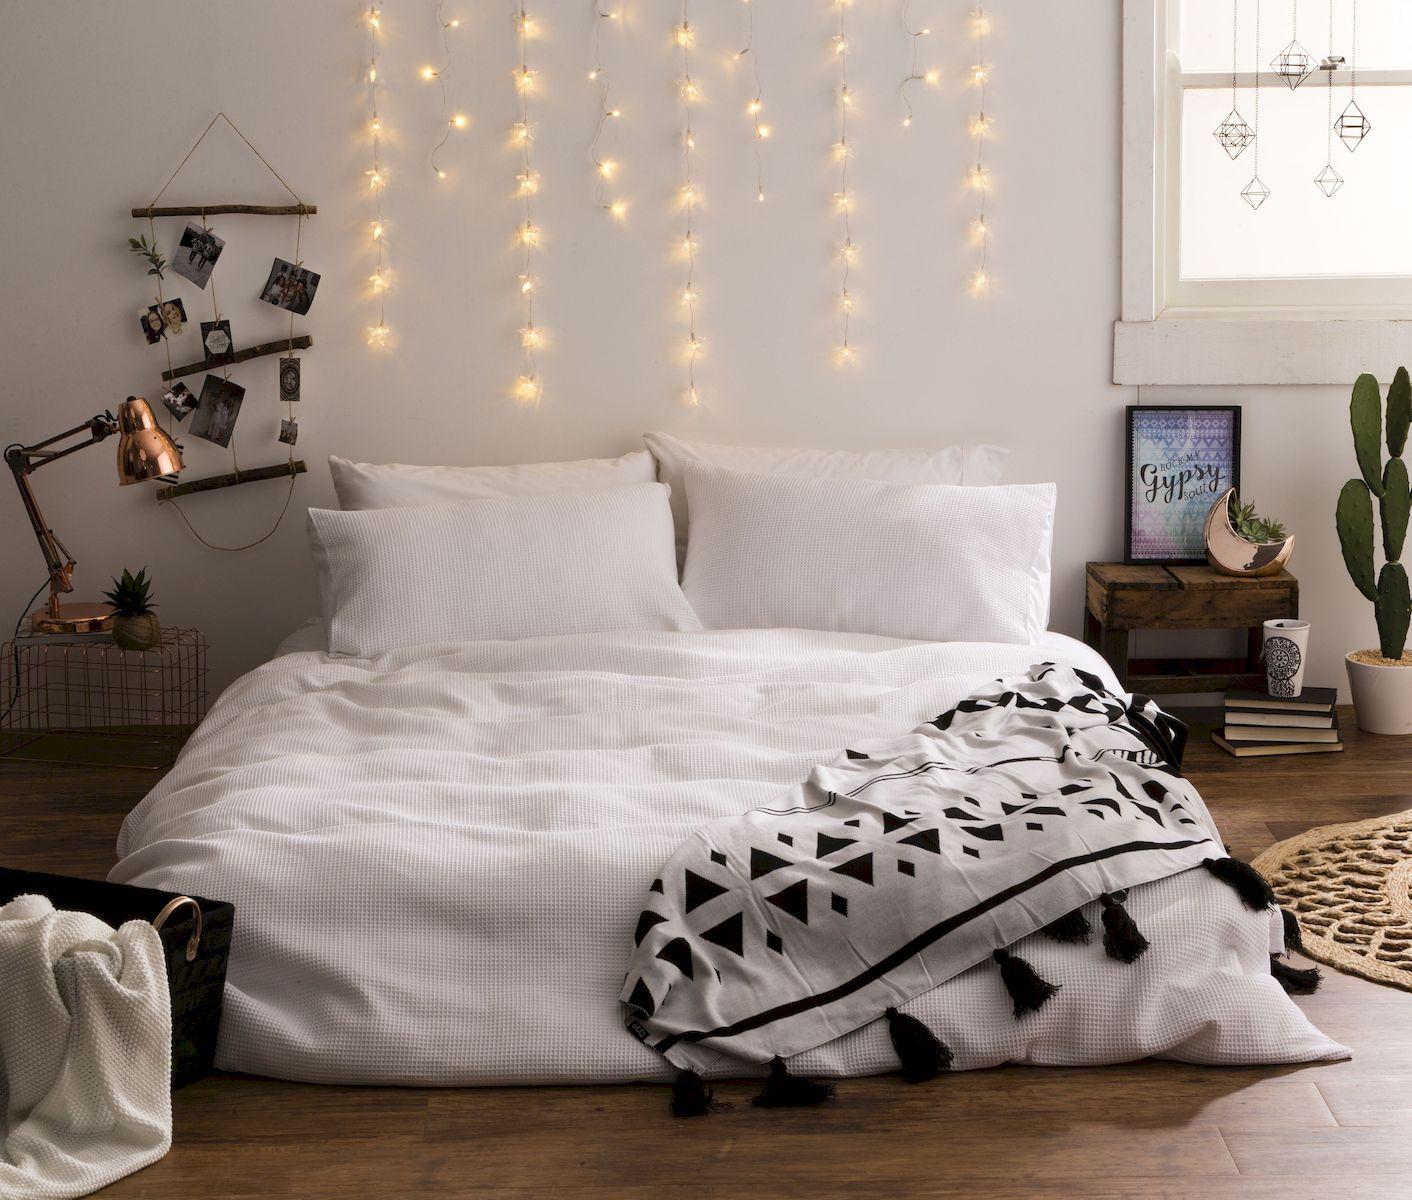 Romantic winter bedroom lighting decoration lighting pinterest